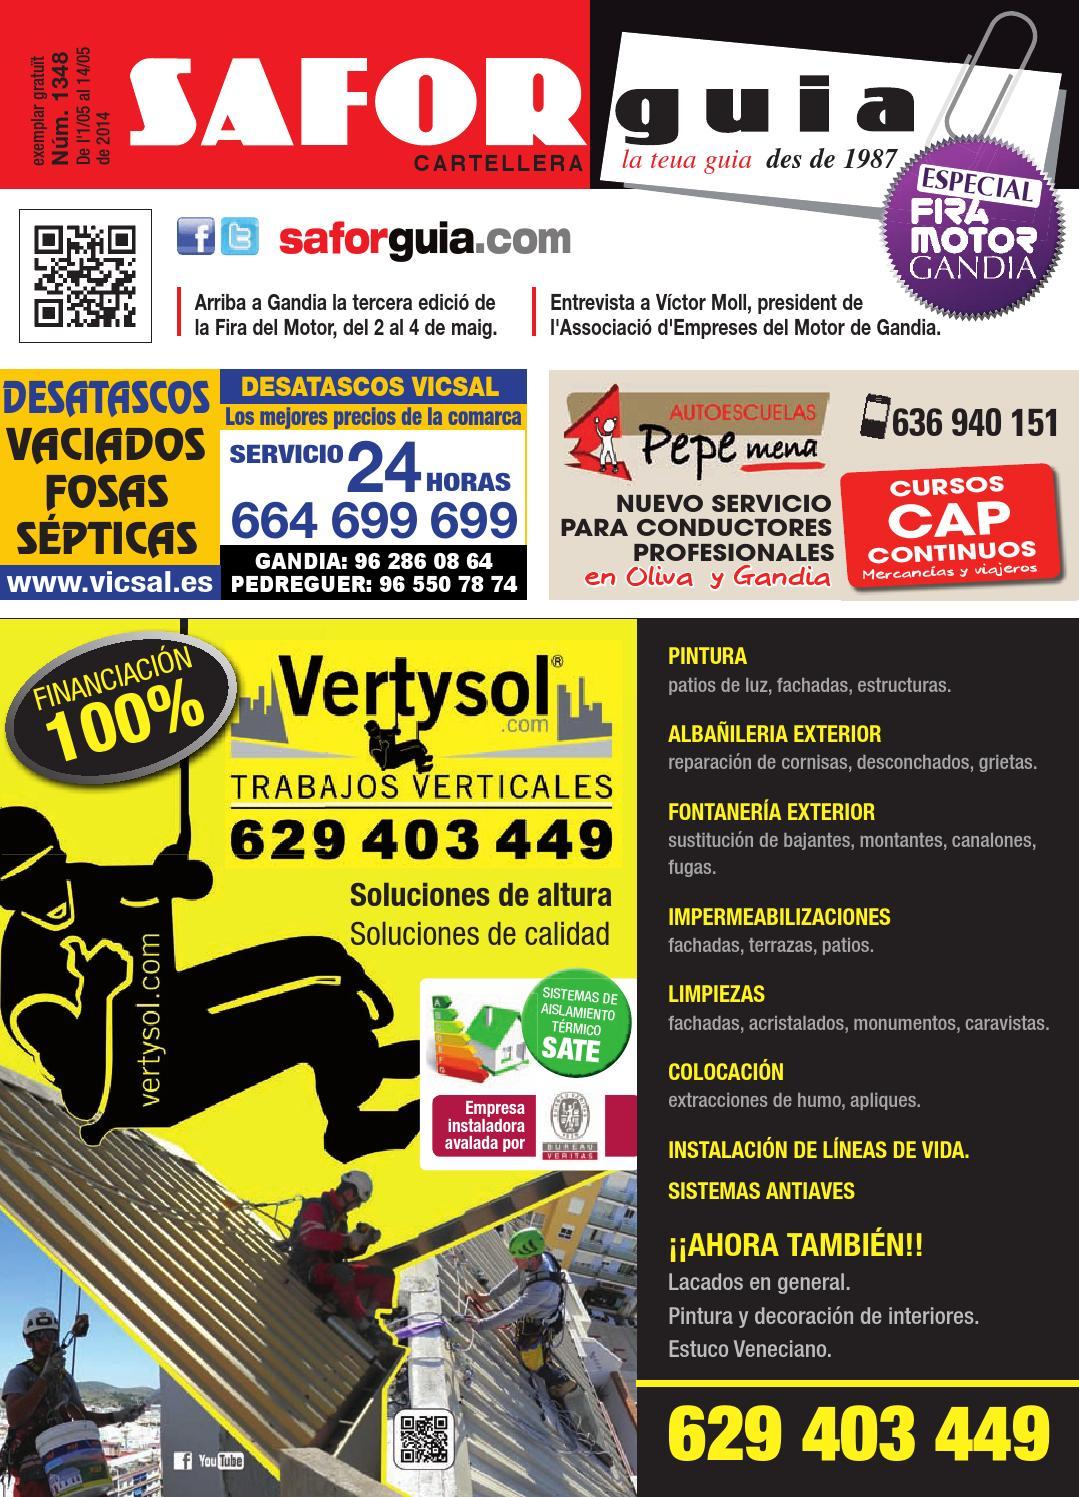 Publicaci N Del 1 Al 14 De Mayo De 2014 By Saforguia  # Muebles Peiro Quart De Poblet